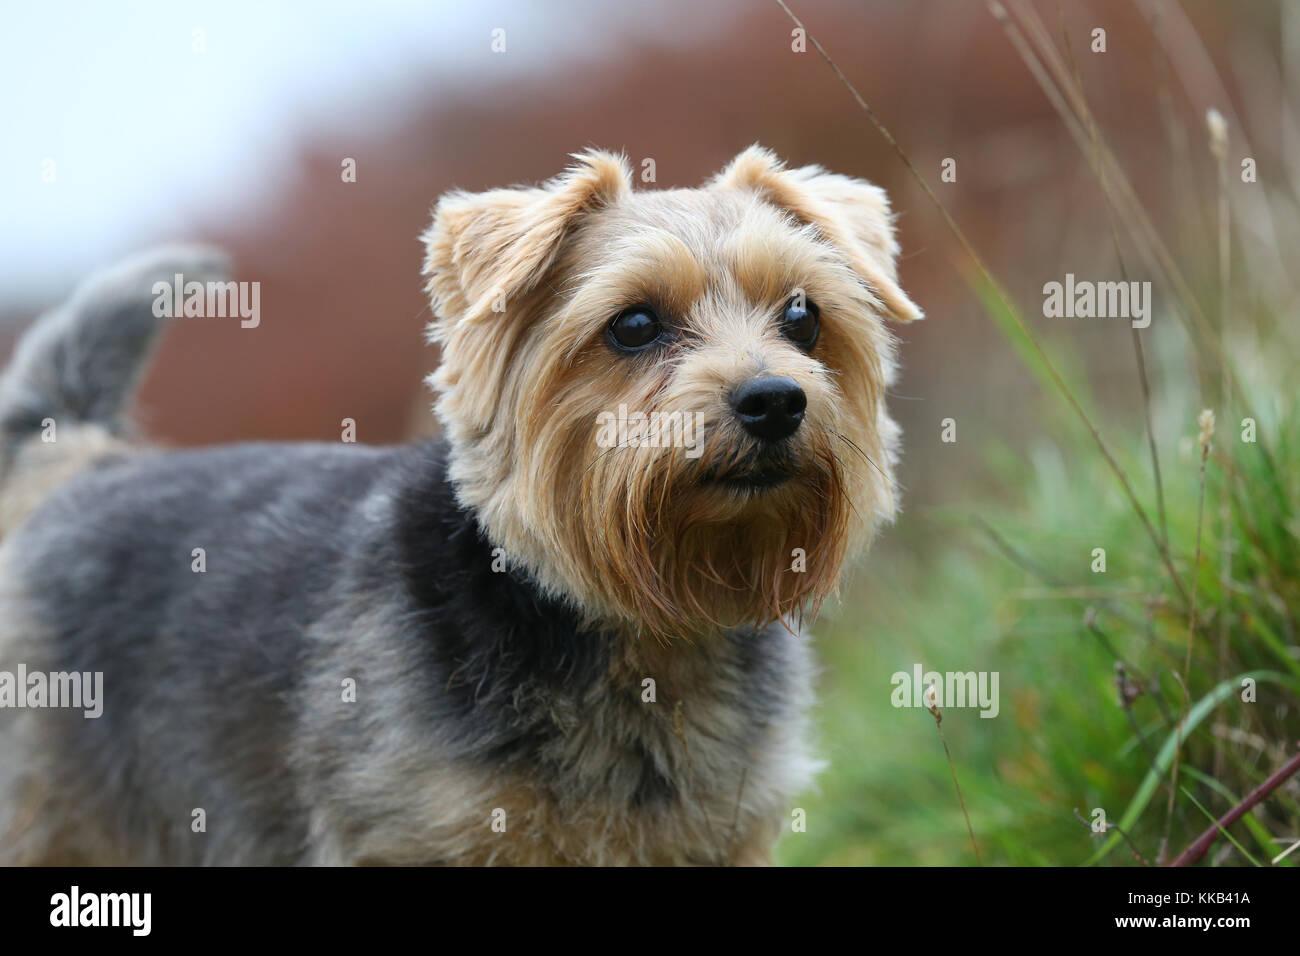 norfolk terrier - Stock Image